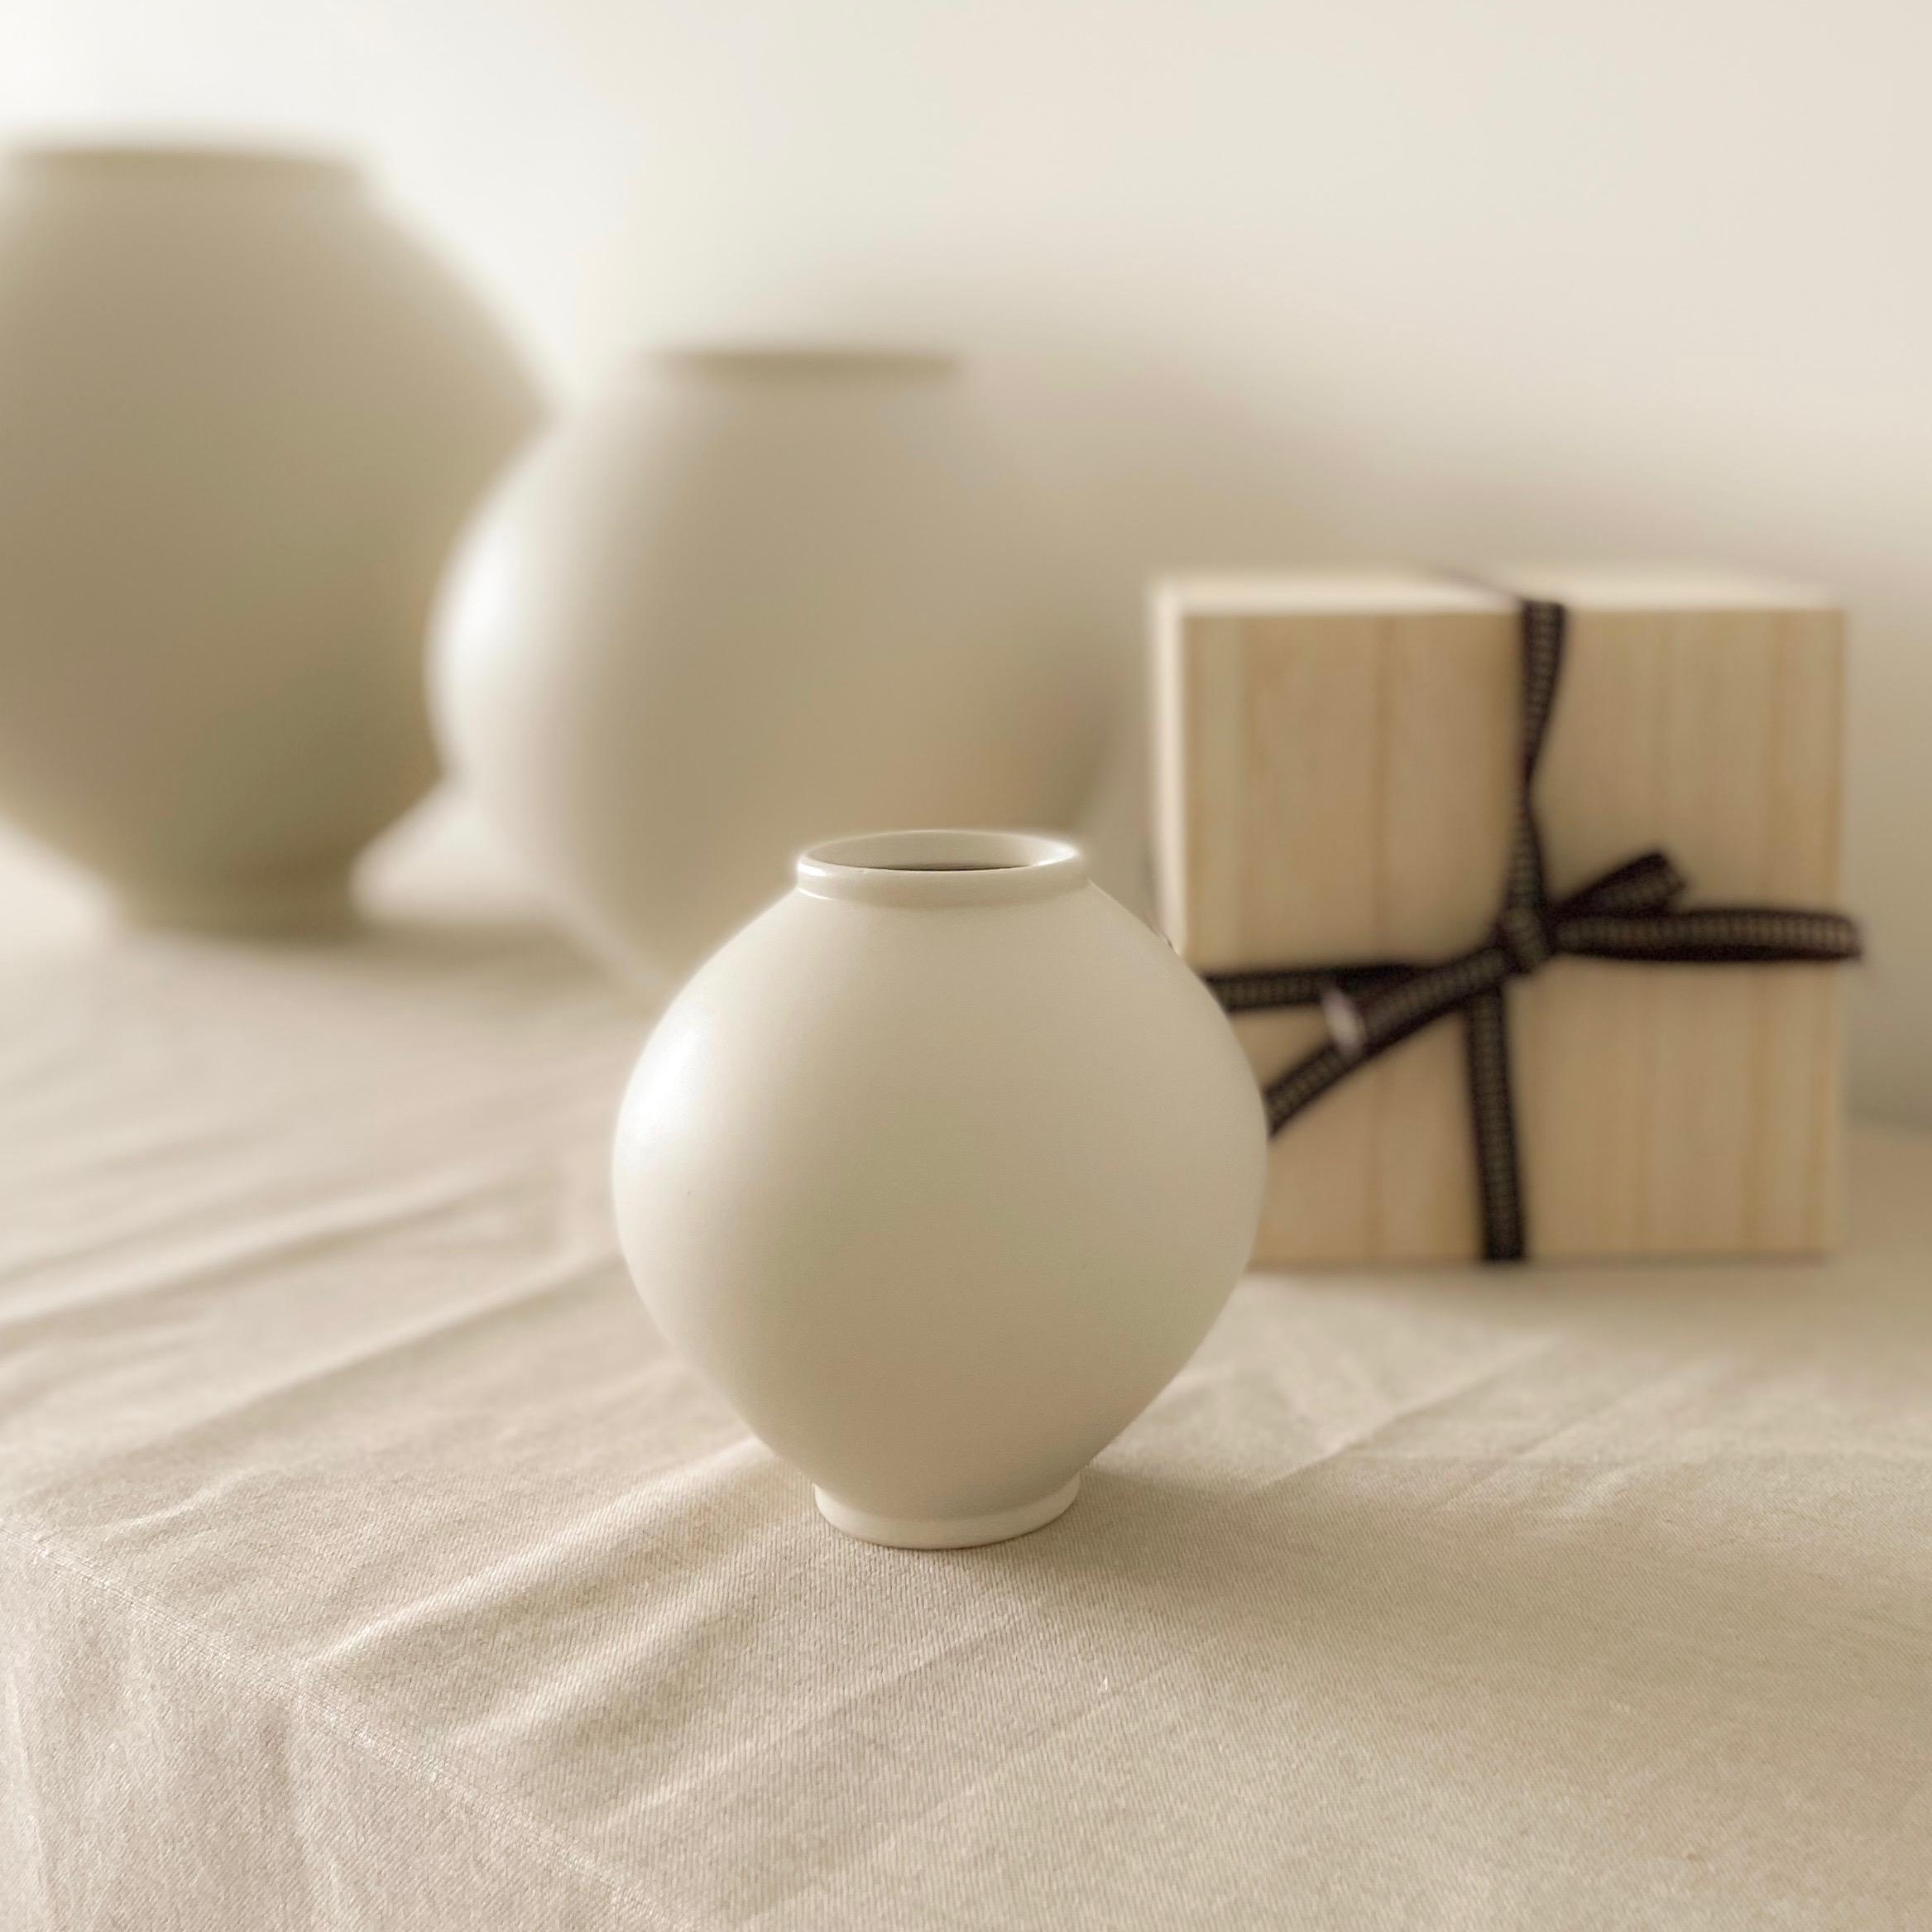 Mini Moon Jar, artist Cho sung hyun,